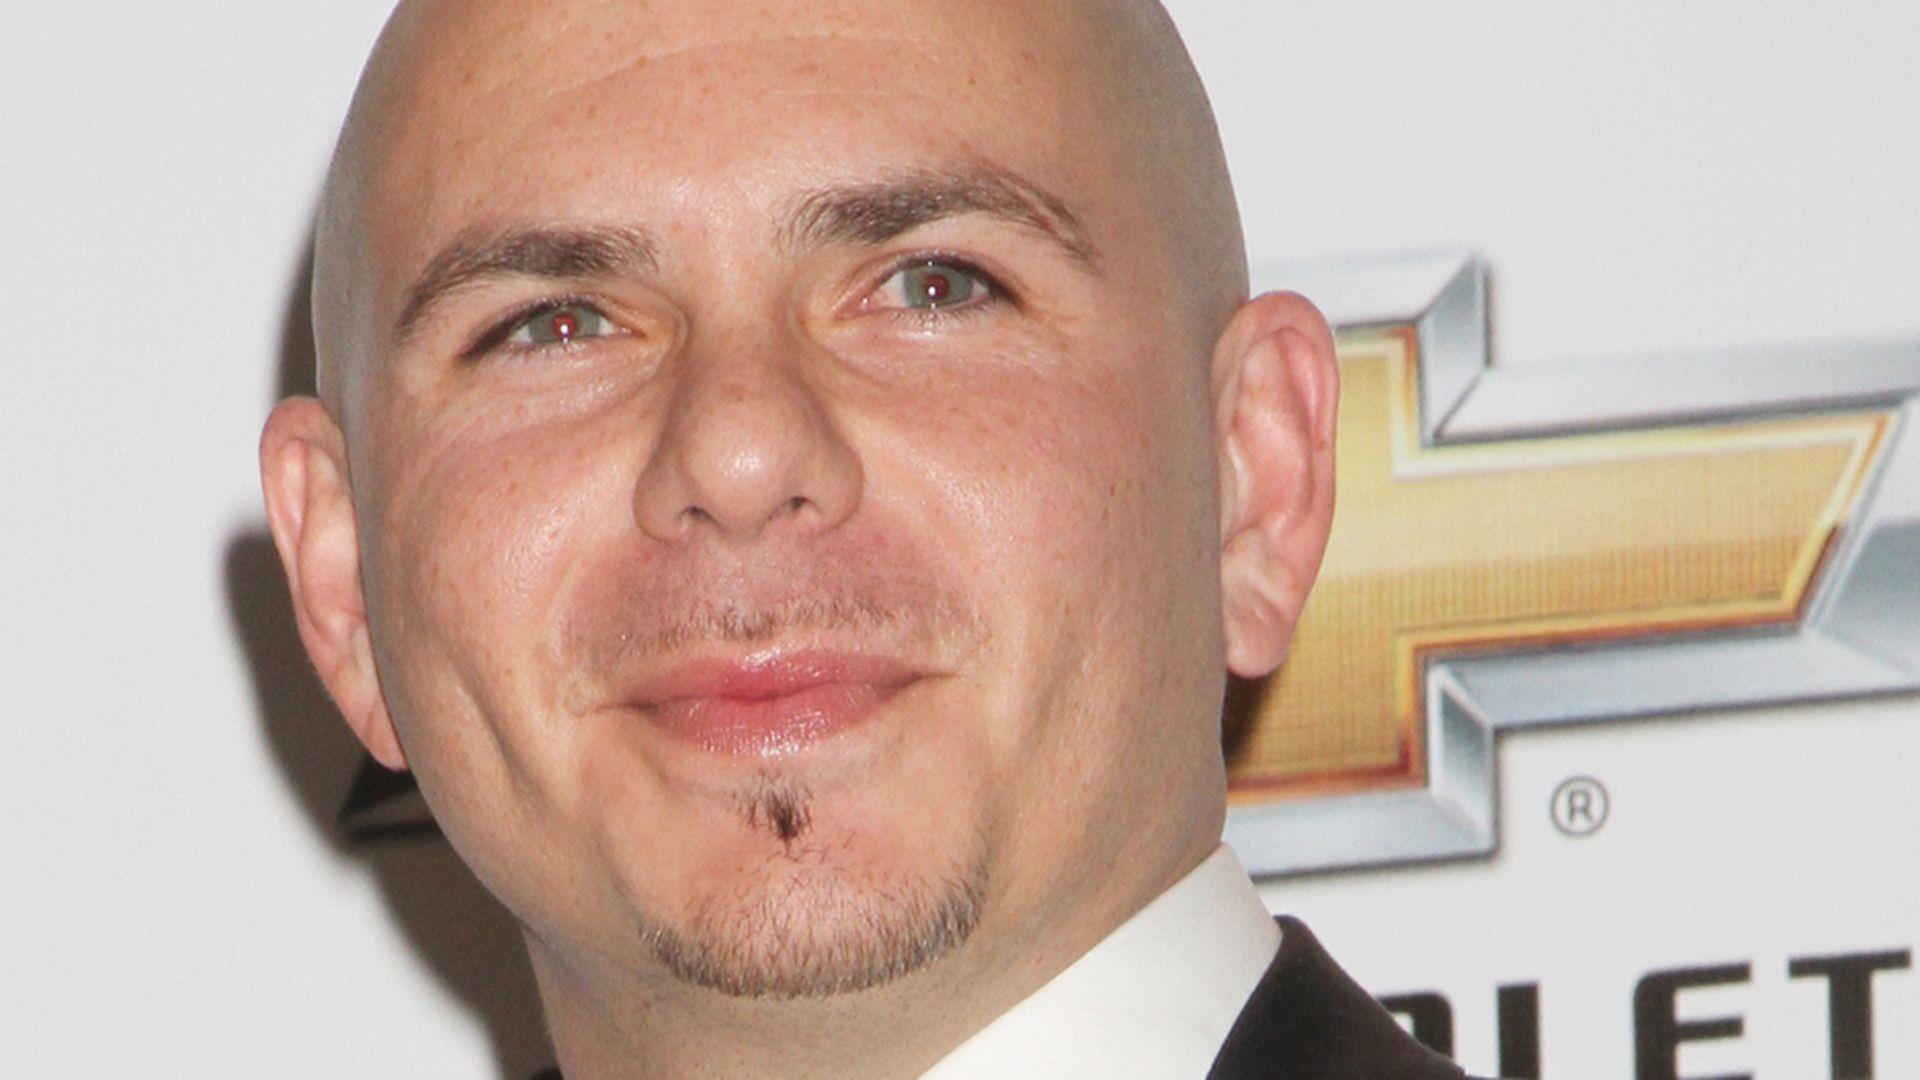 Pitbull Rapper Wallpaper 55 Images